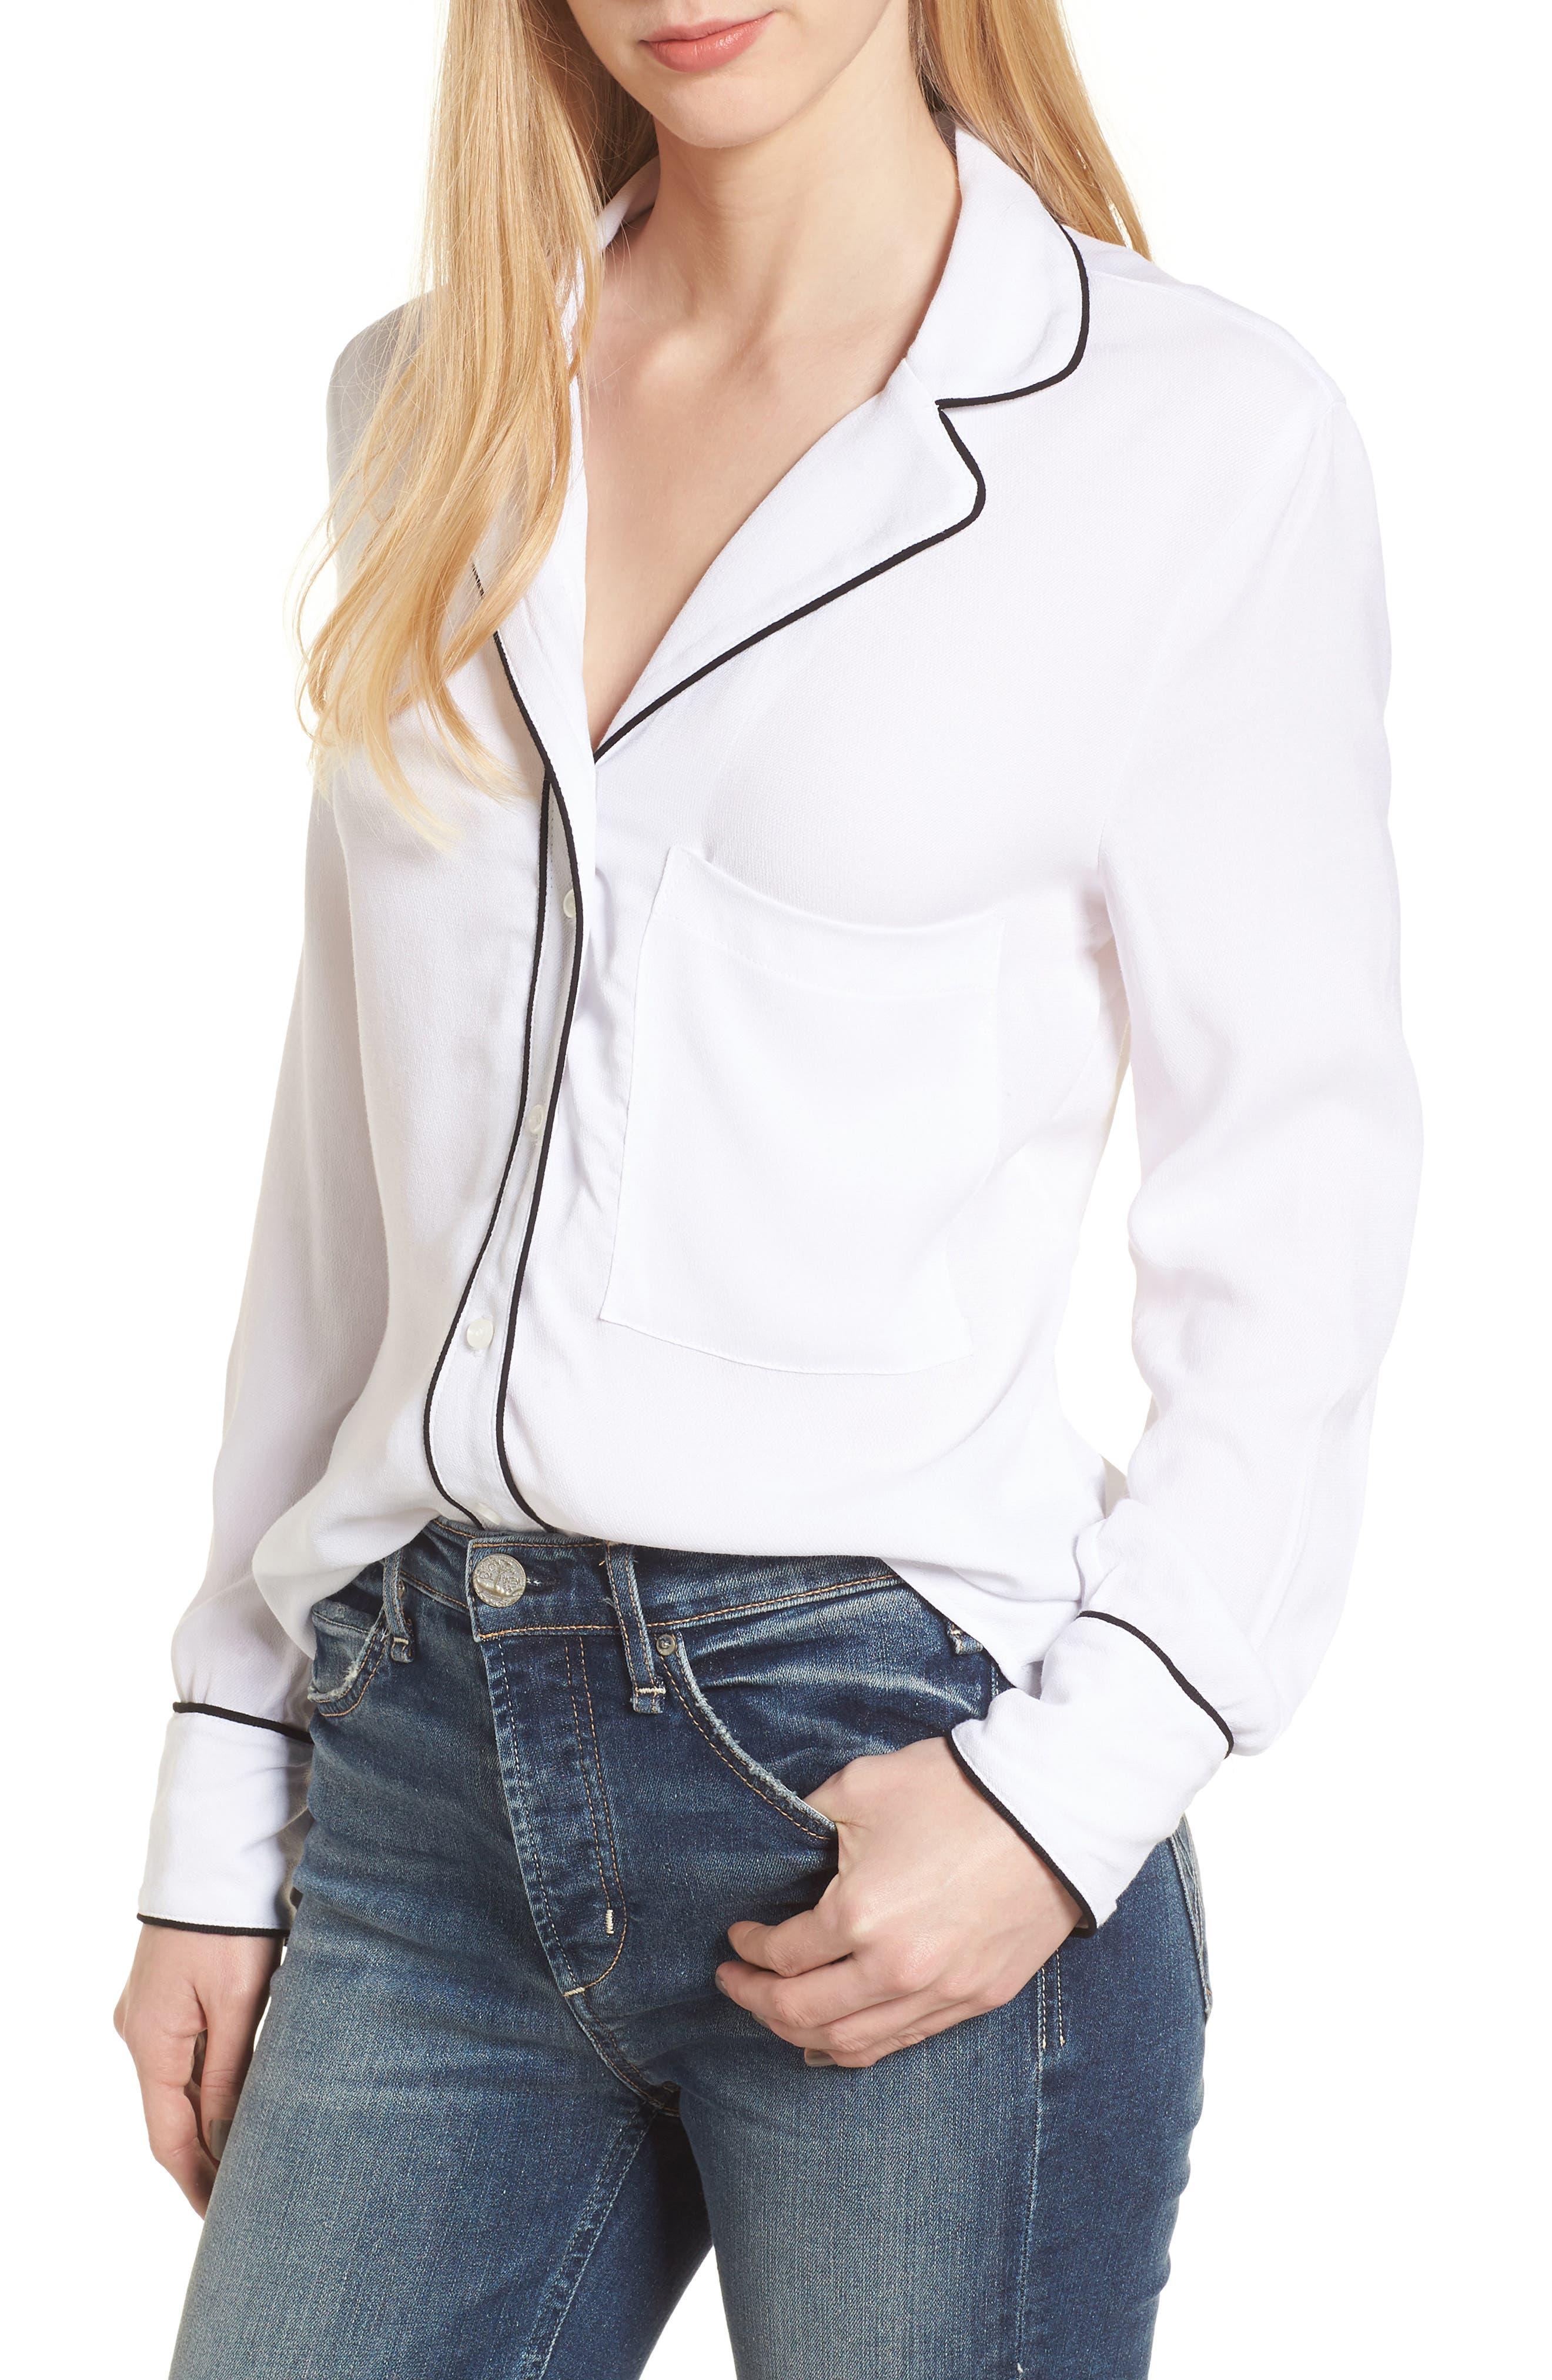 Main Image - McGuire Rossi Pajama Top